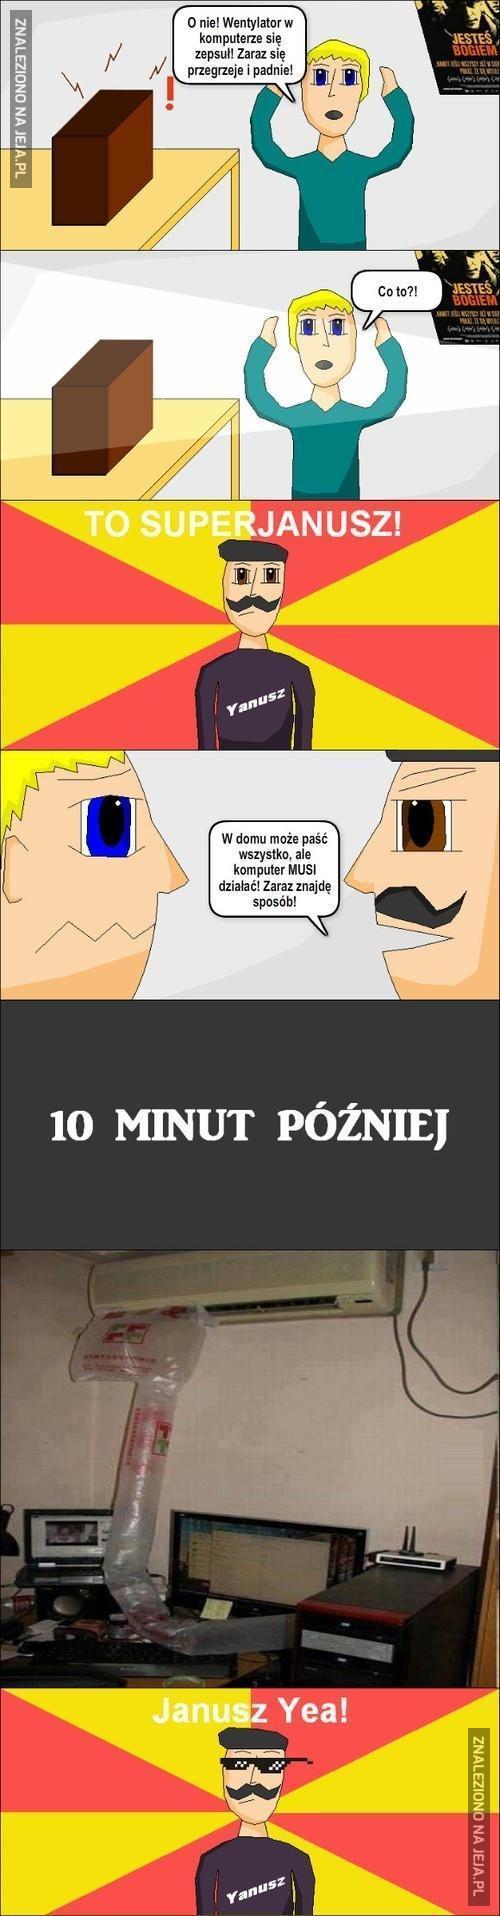 Janusz elektroniki